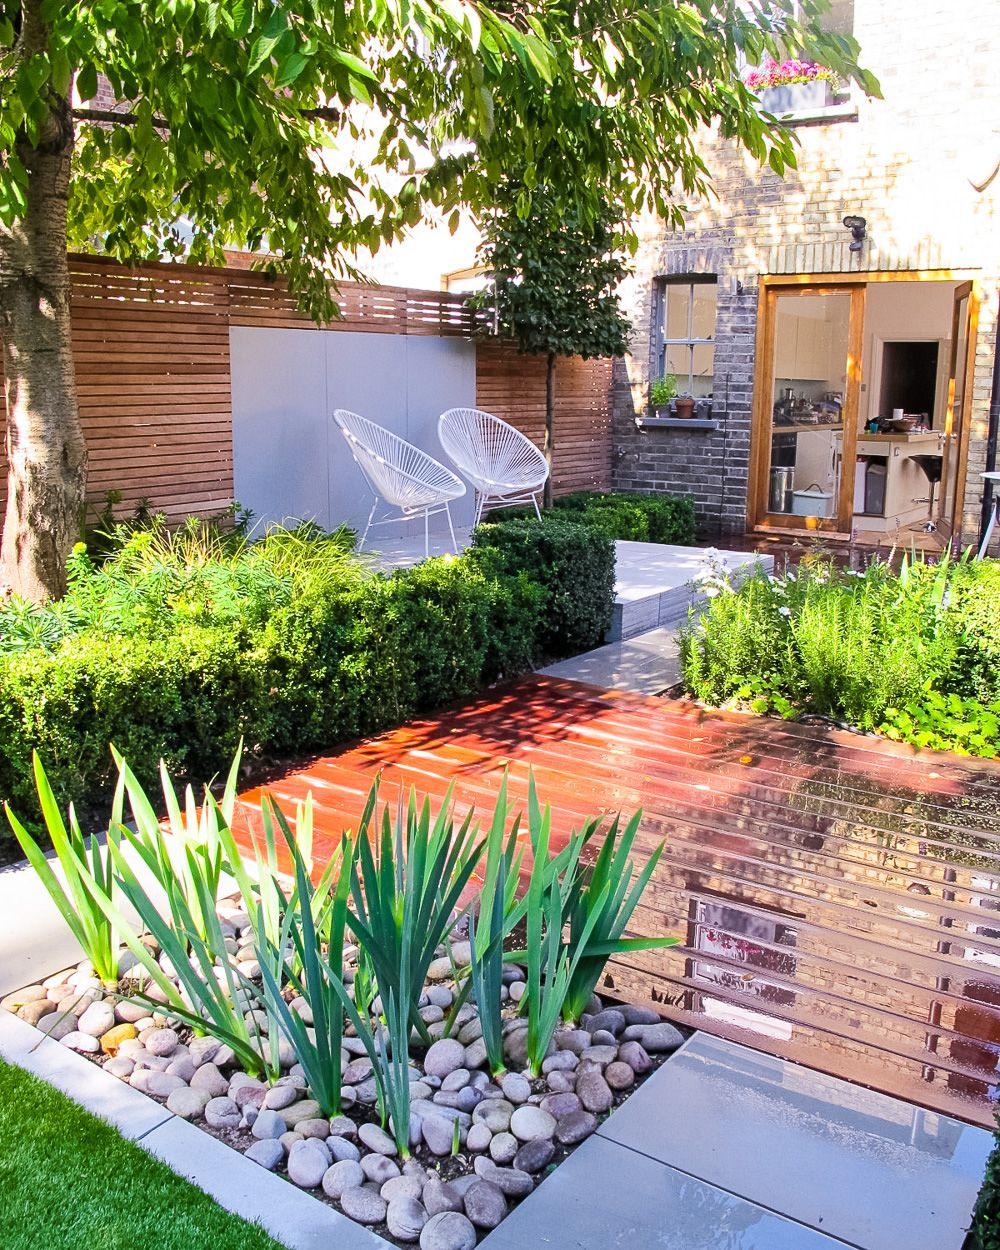 Pretty Cool Gardening Idea For Inspiration Love The Colour Idea Urb Small Backyard Garden Design Small Backyard Gardens Small Backyard Landscaping